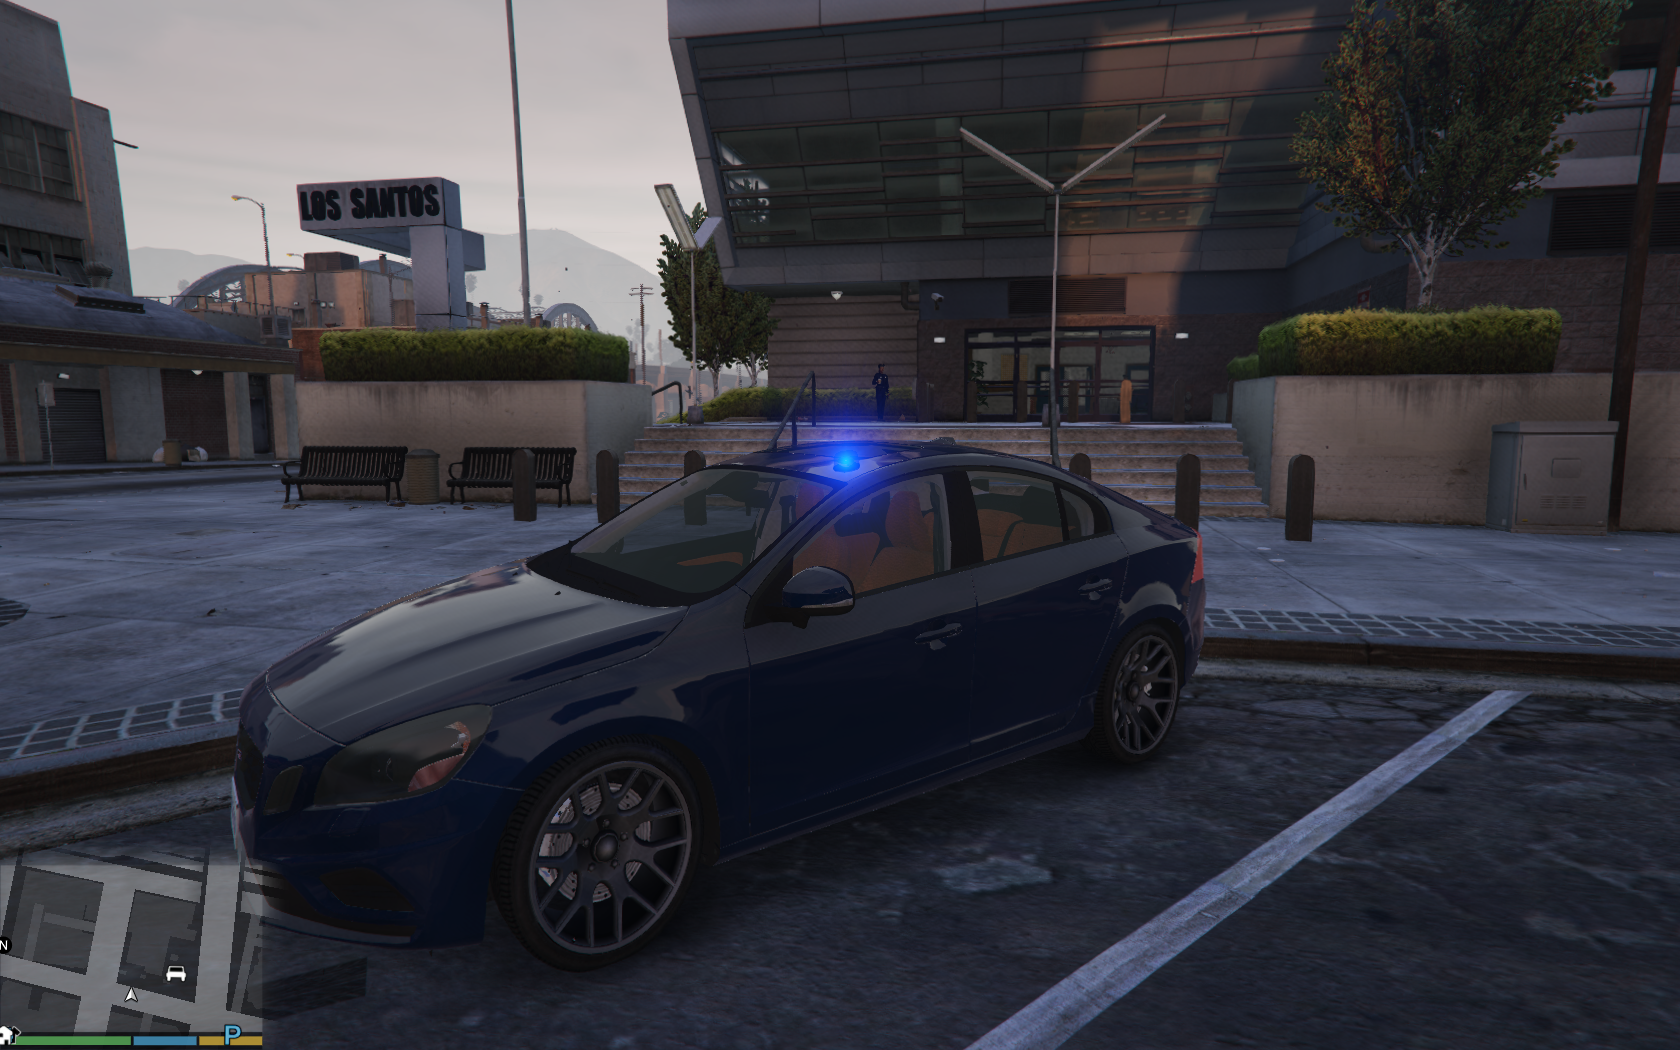 Unmarked police car gta 5 - 2a25ca Gta5 2015 09 17 14 13 35 20